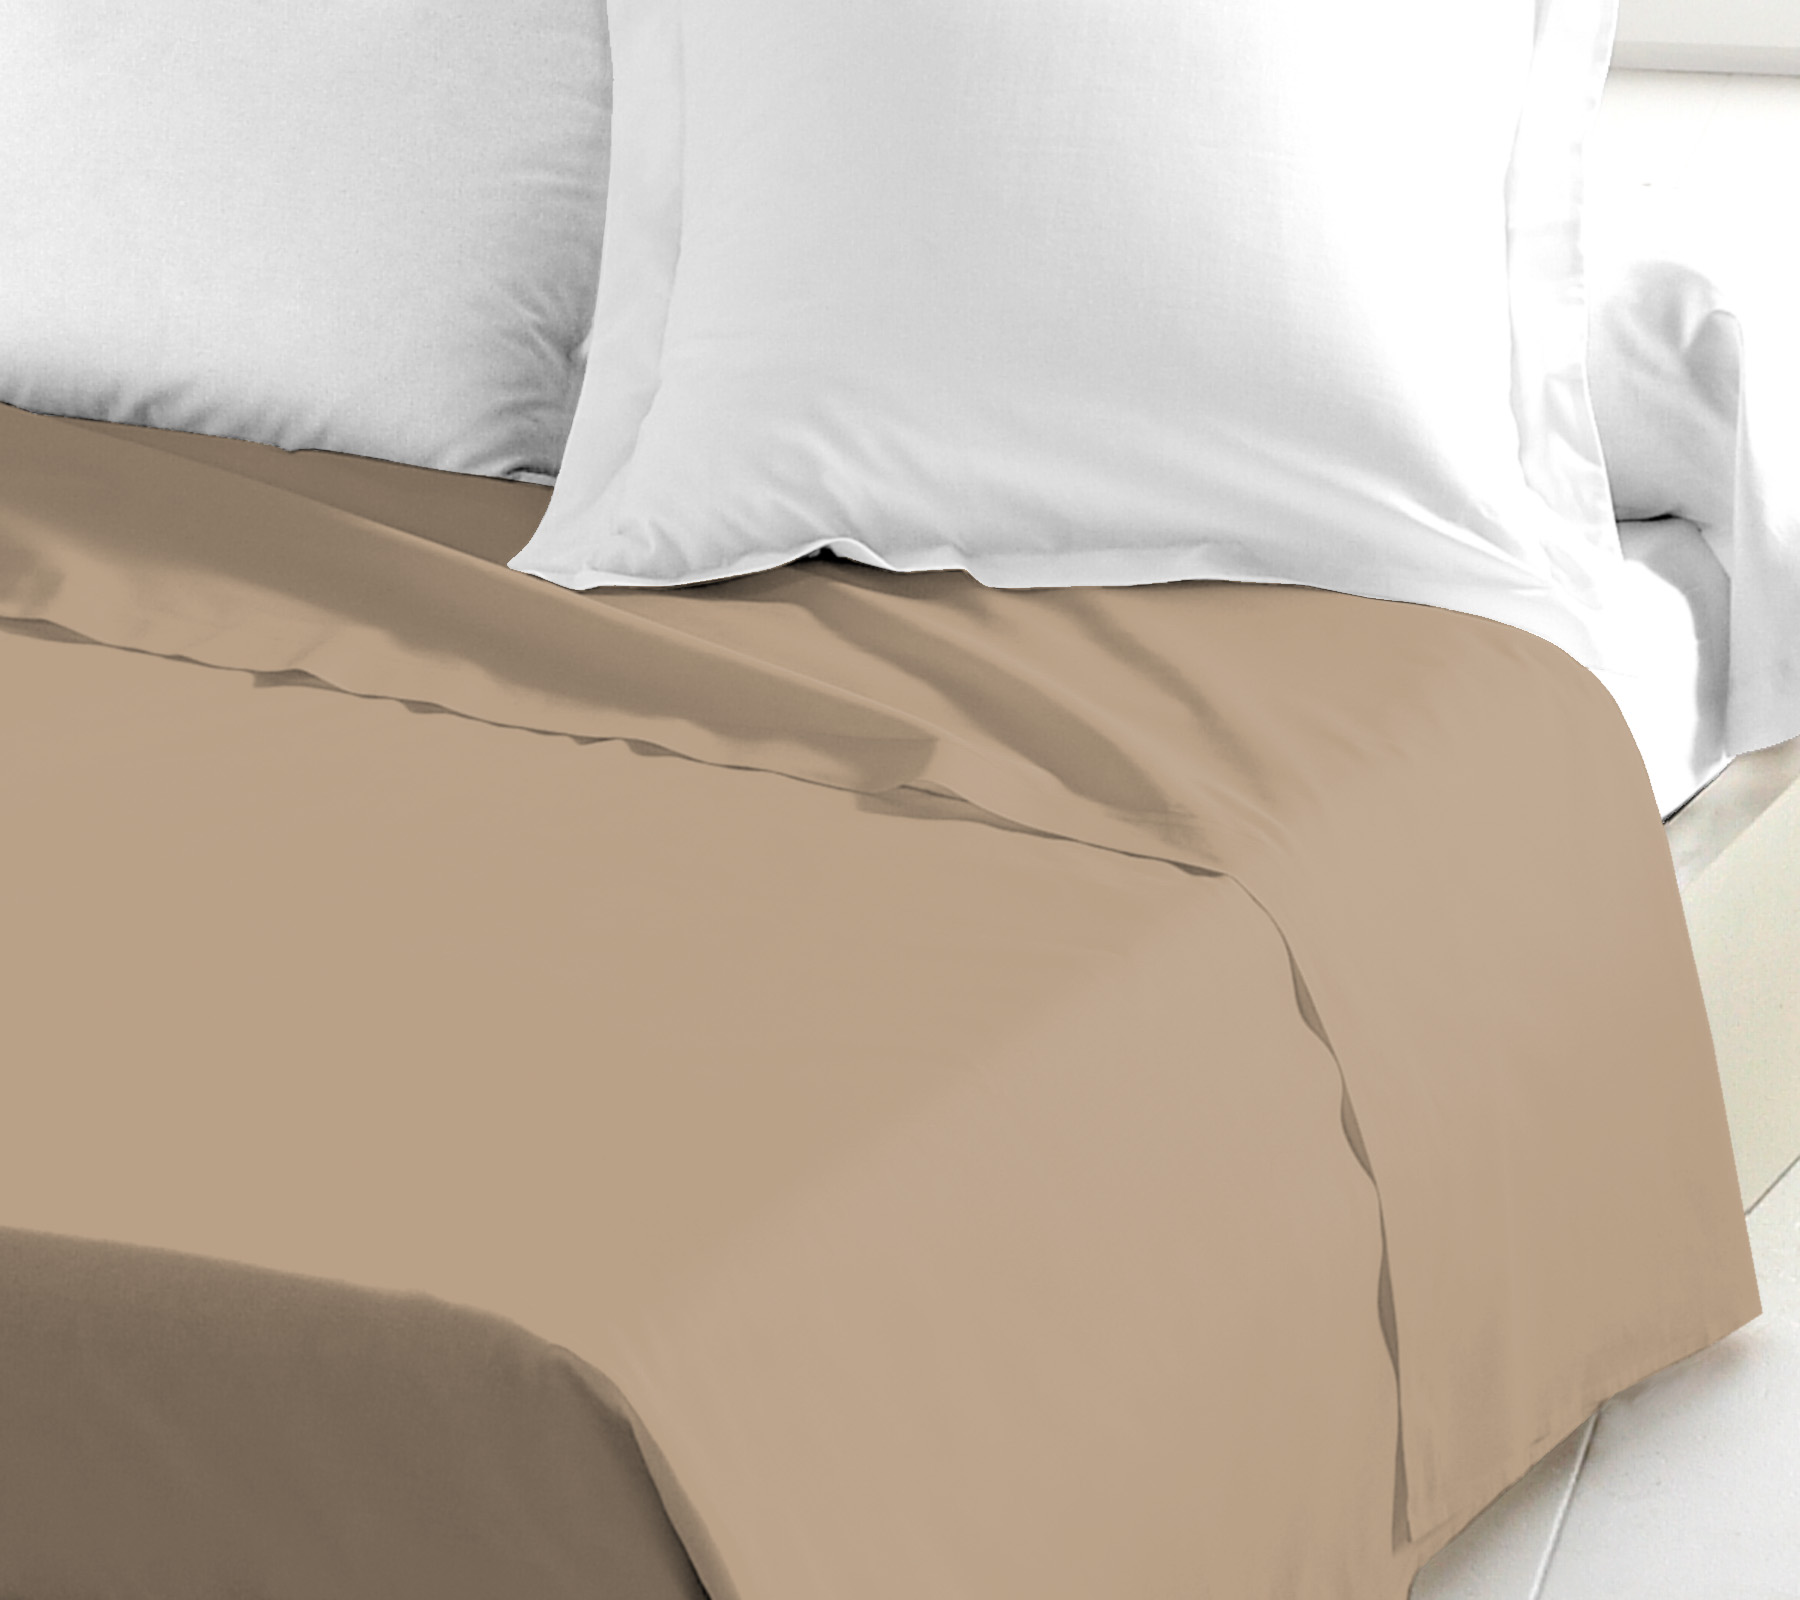 Drap plat 100% coton 180x290 lin